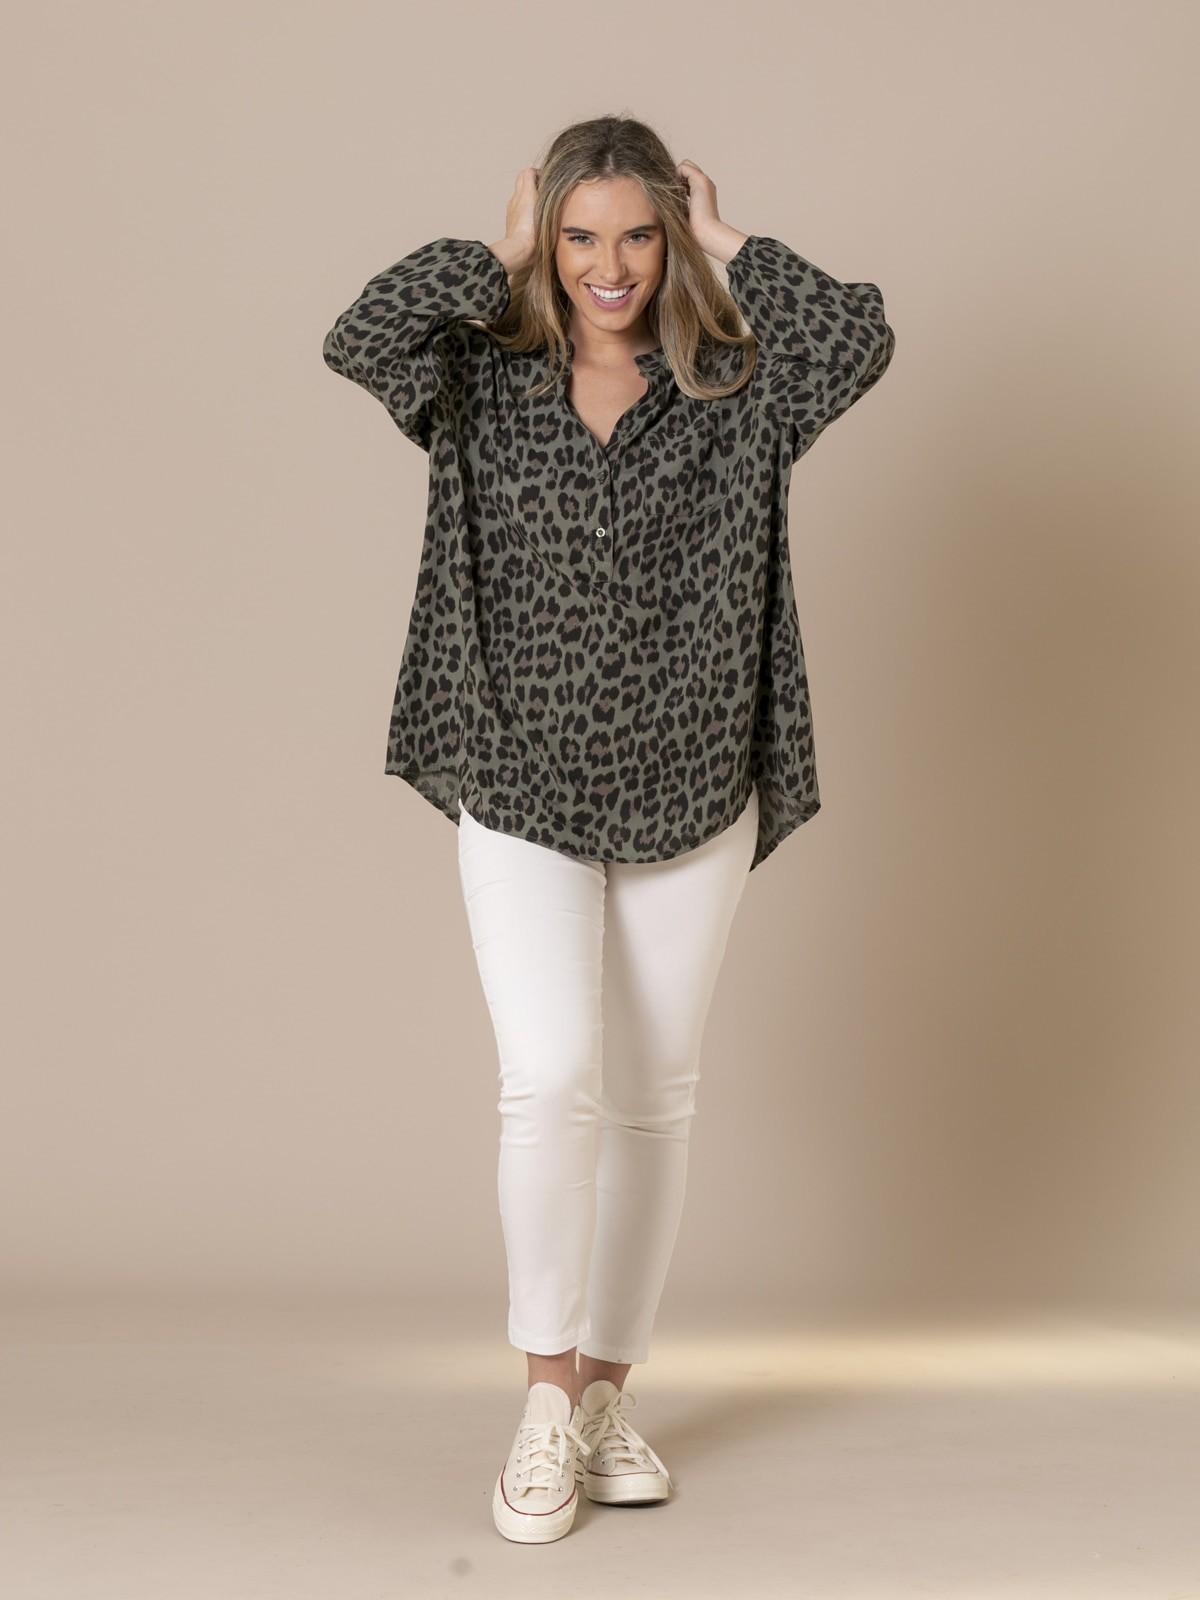 Camisa mujer botones animal print Caqui